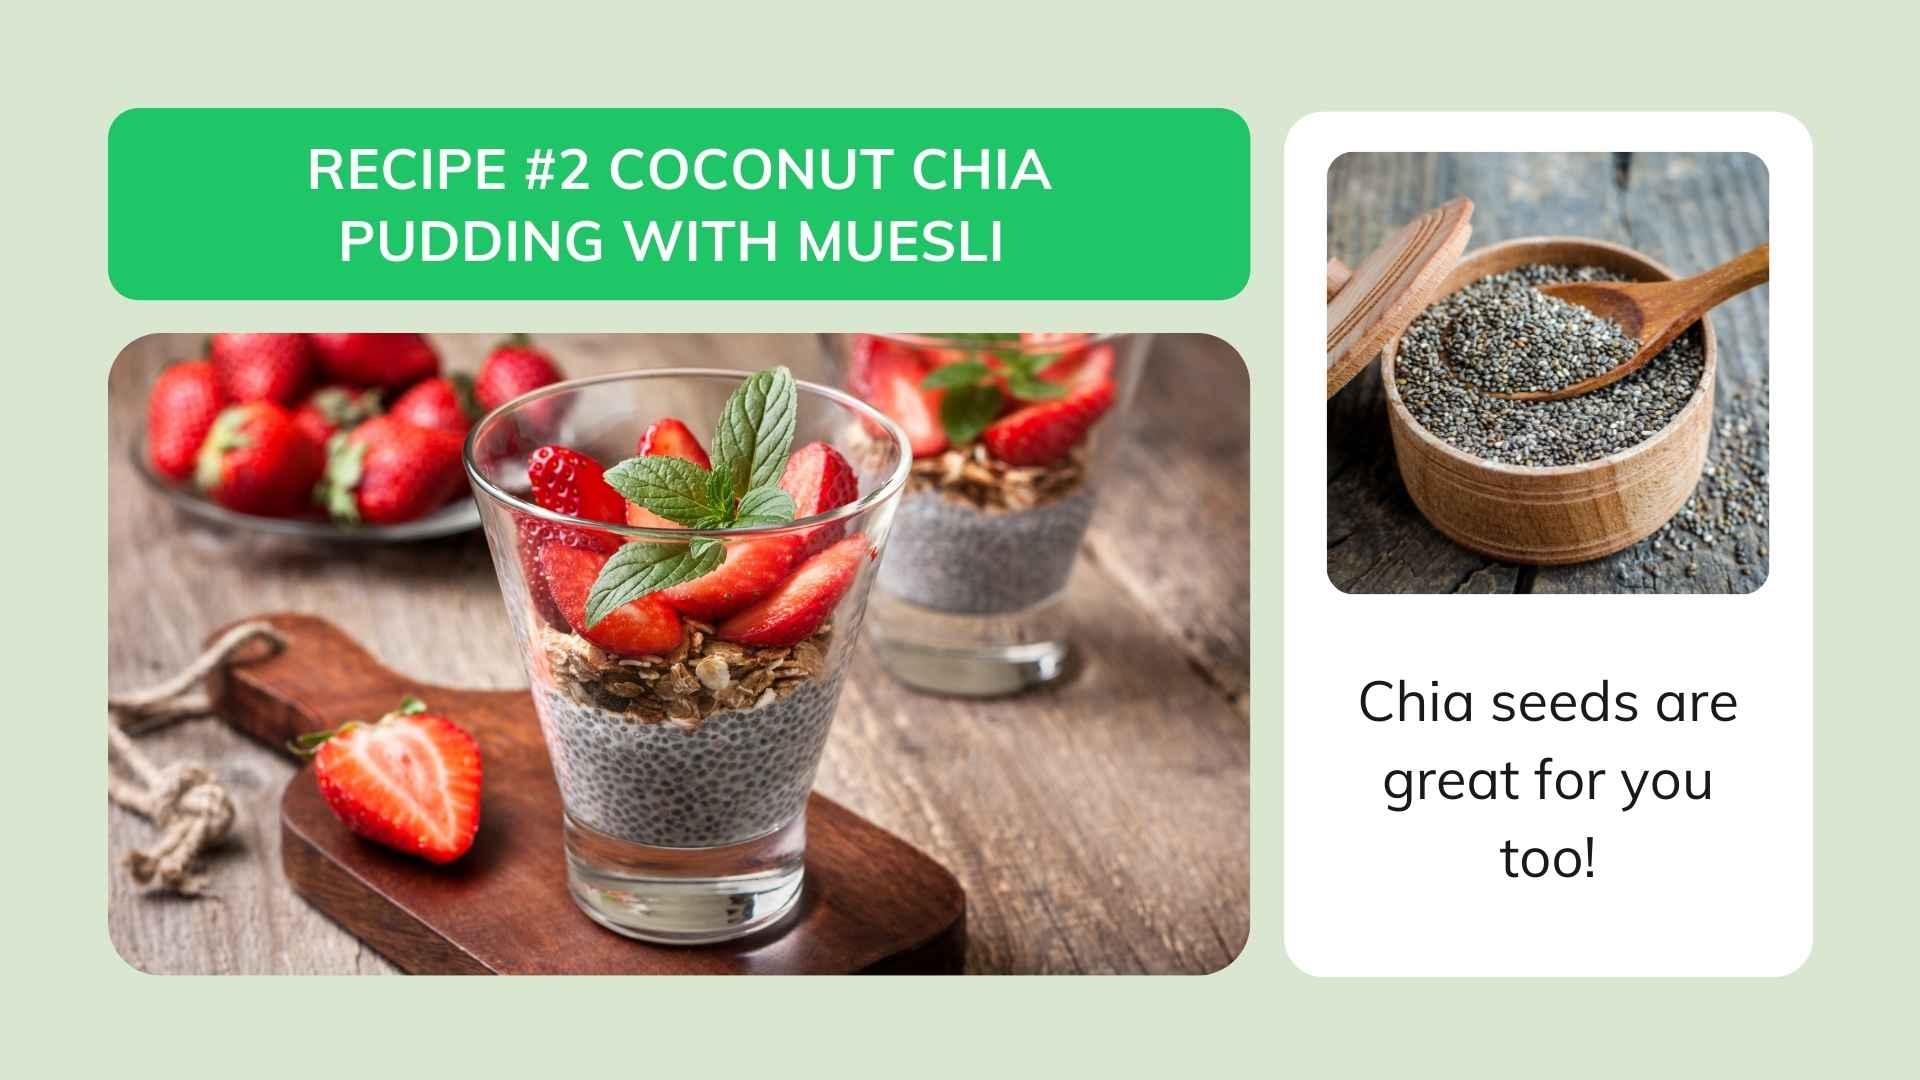 Recipe #2 Coconut Chia Pudding With Muesli